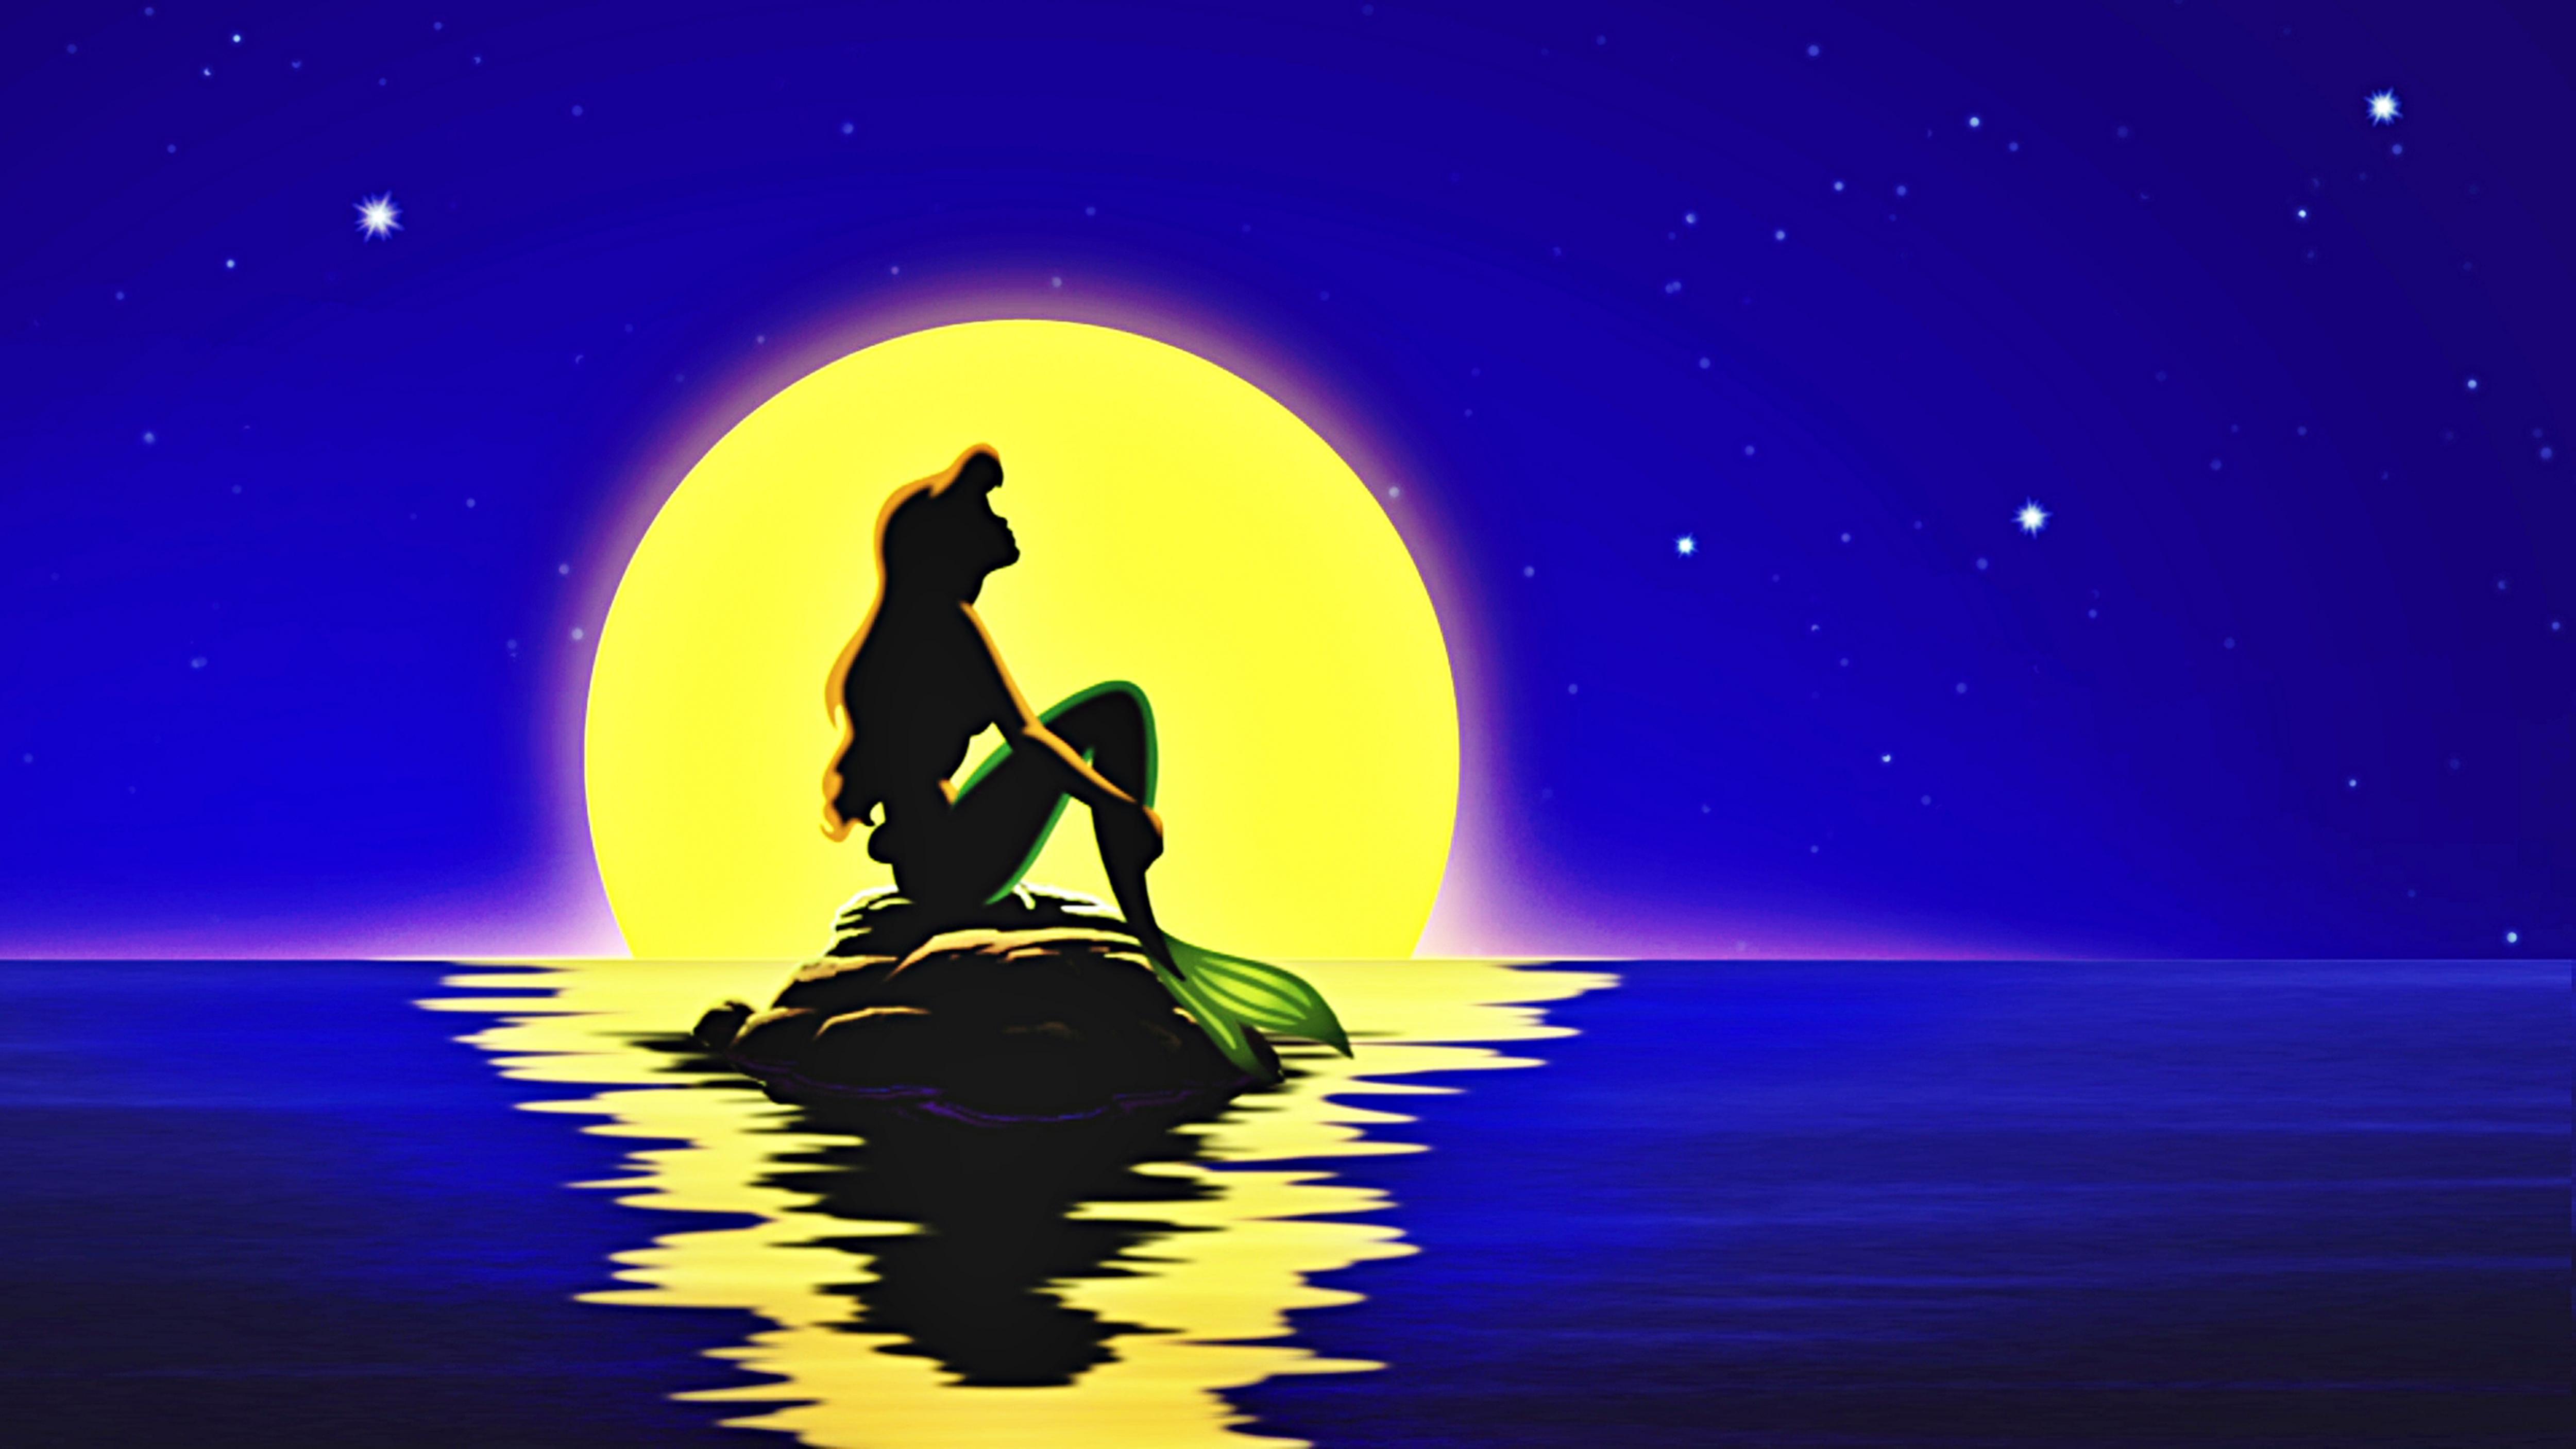 Walt Disney Wallpapers   The Little Mermaid   Walt Disney Characters 5000x2813